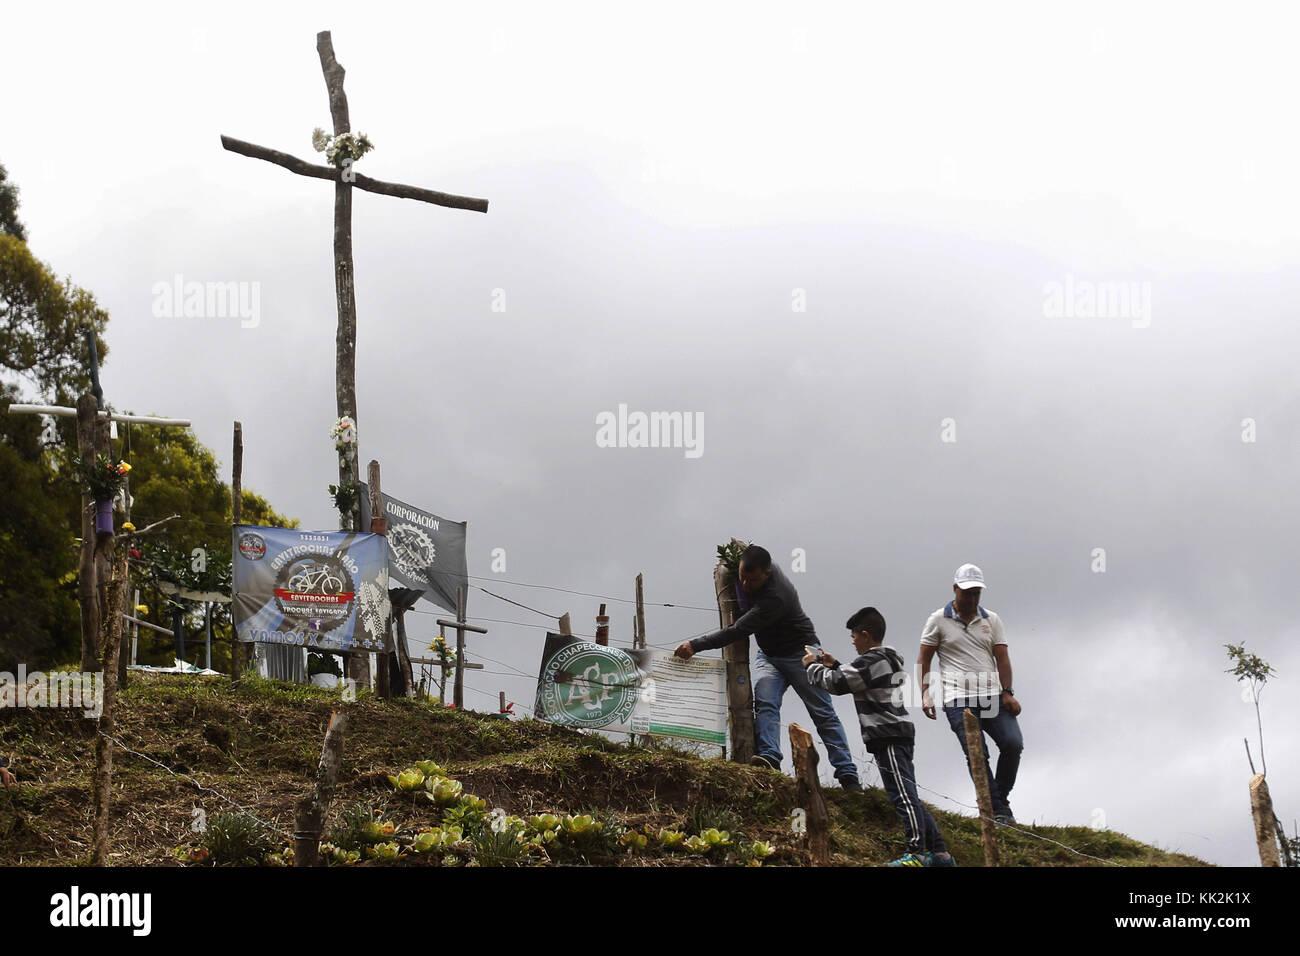 La Union, Antioquia, Colombia. 27th Nov, 2017. A family vists the Chapecoense Mountain in La Union, Antioquia, Colombia, - Stock Image